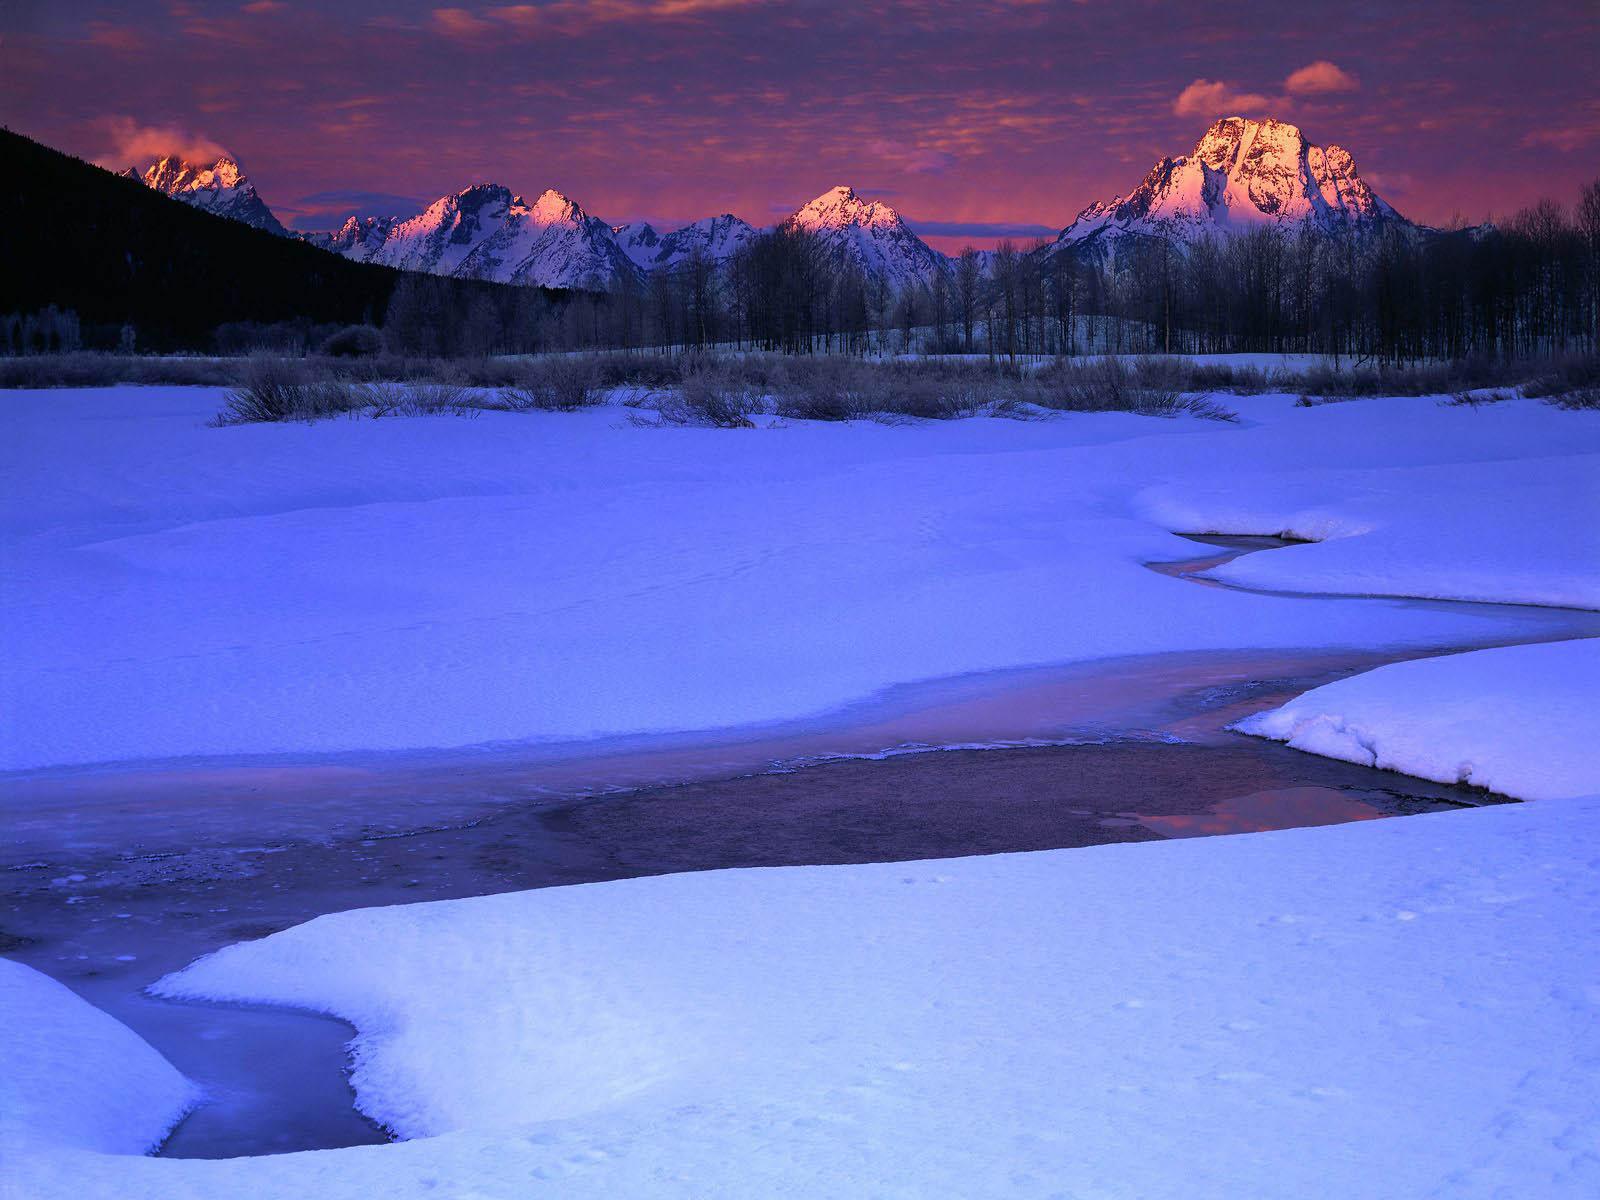 HD Wallpapers: Winter Desktop Backgrounds